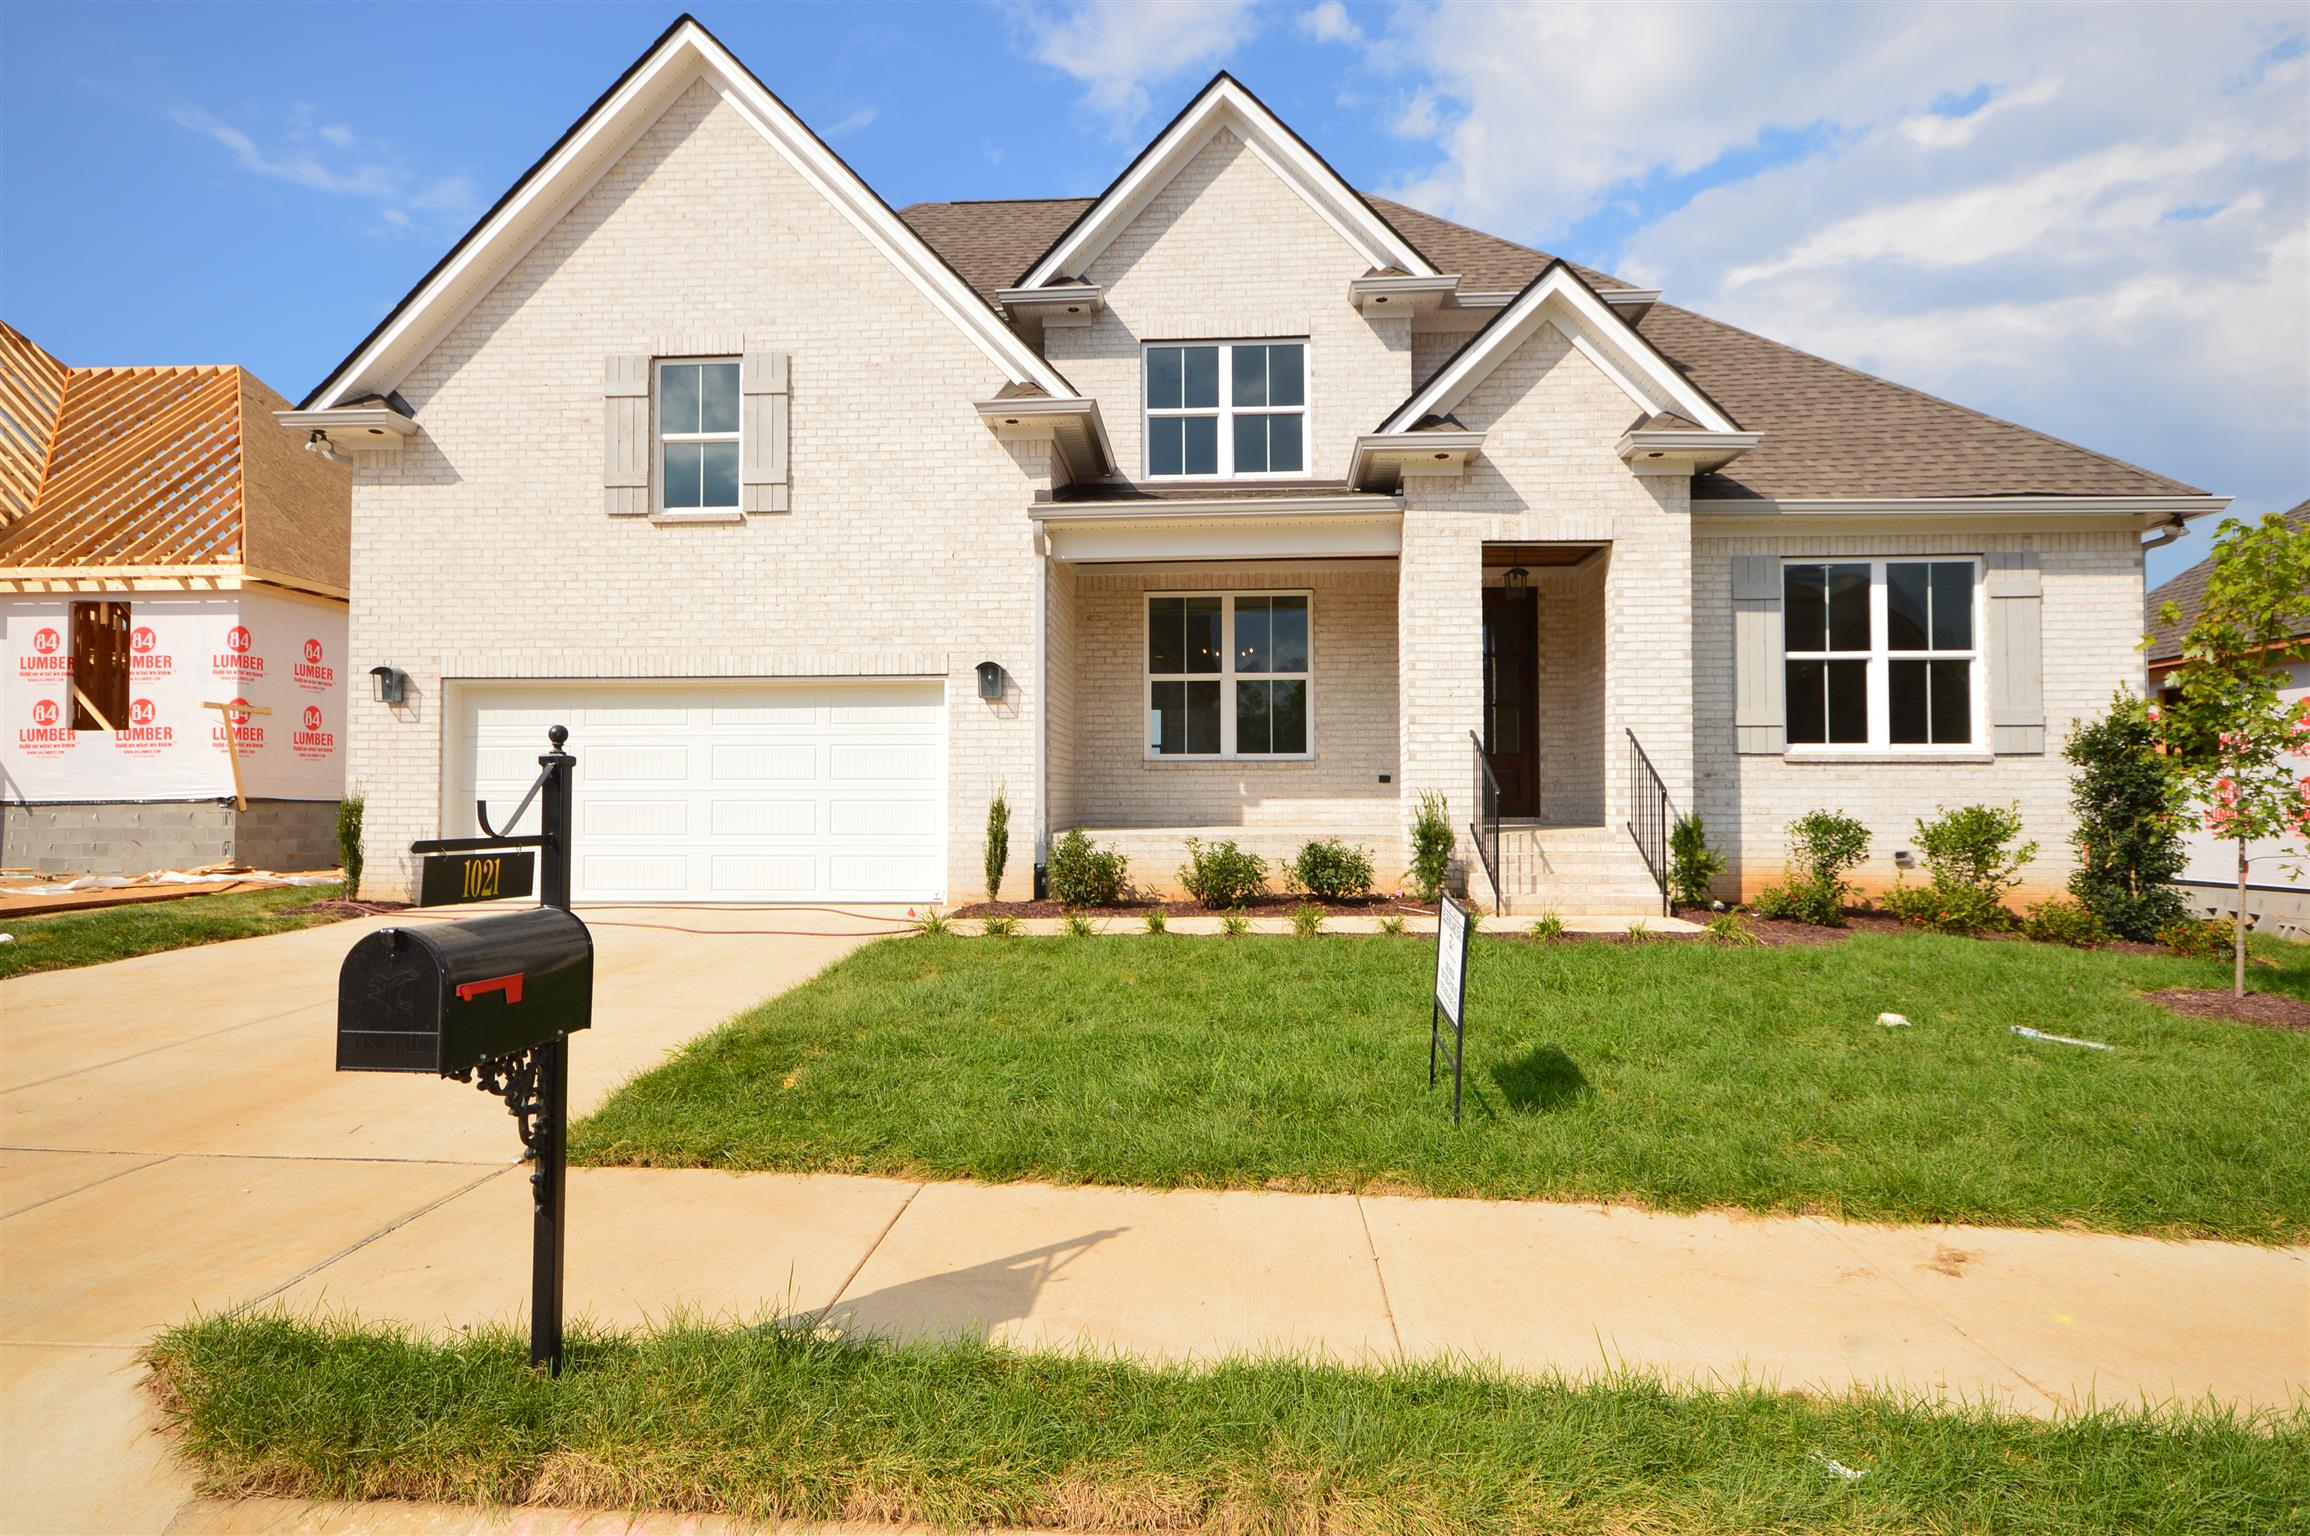 1021 Alpaca Drive (404), Spring Hill, TN 37174 - Spring Hill, TN real estate listing